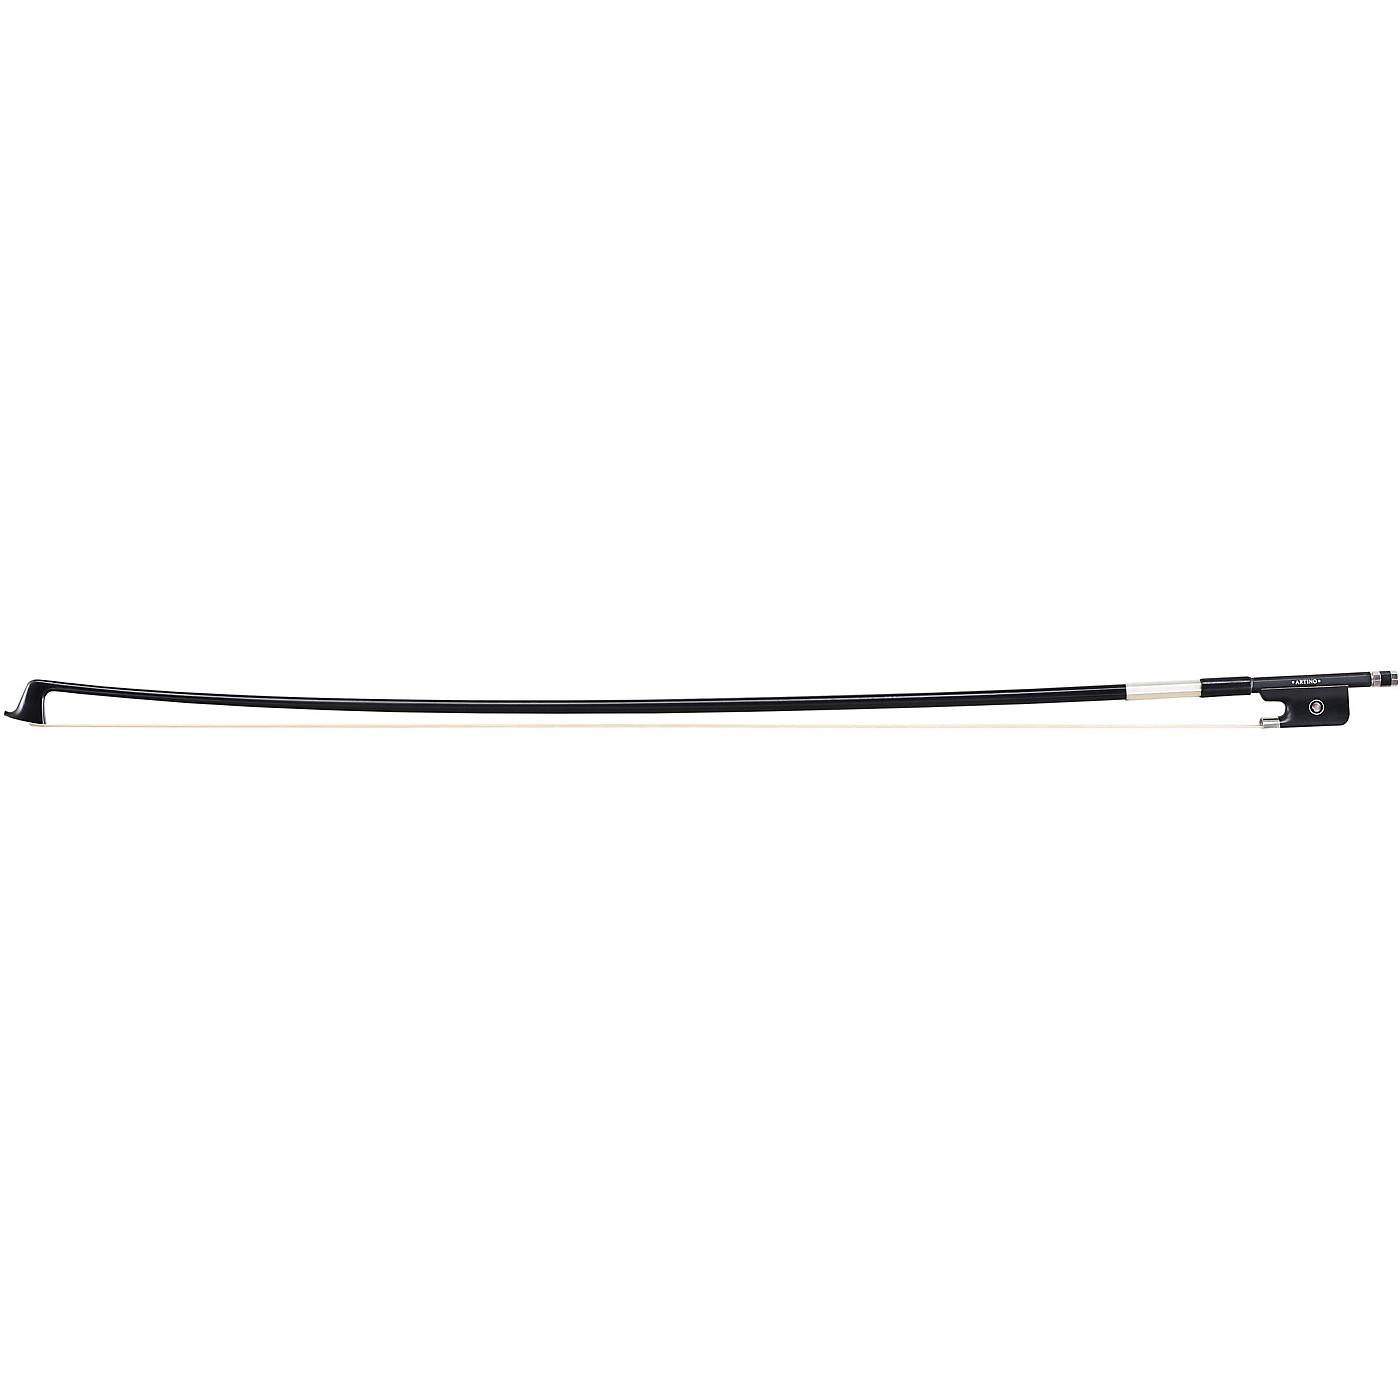 Artino Series Carbon Fiber Viola Bow thumbnail